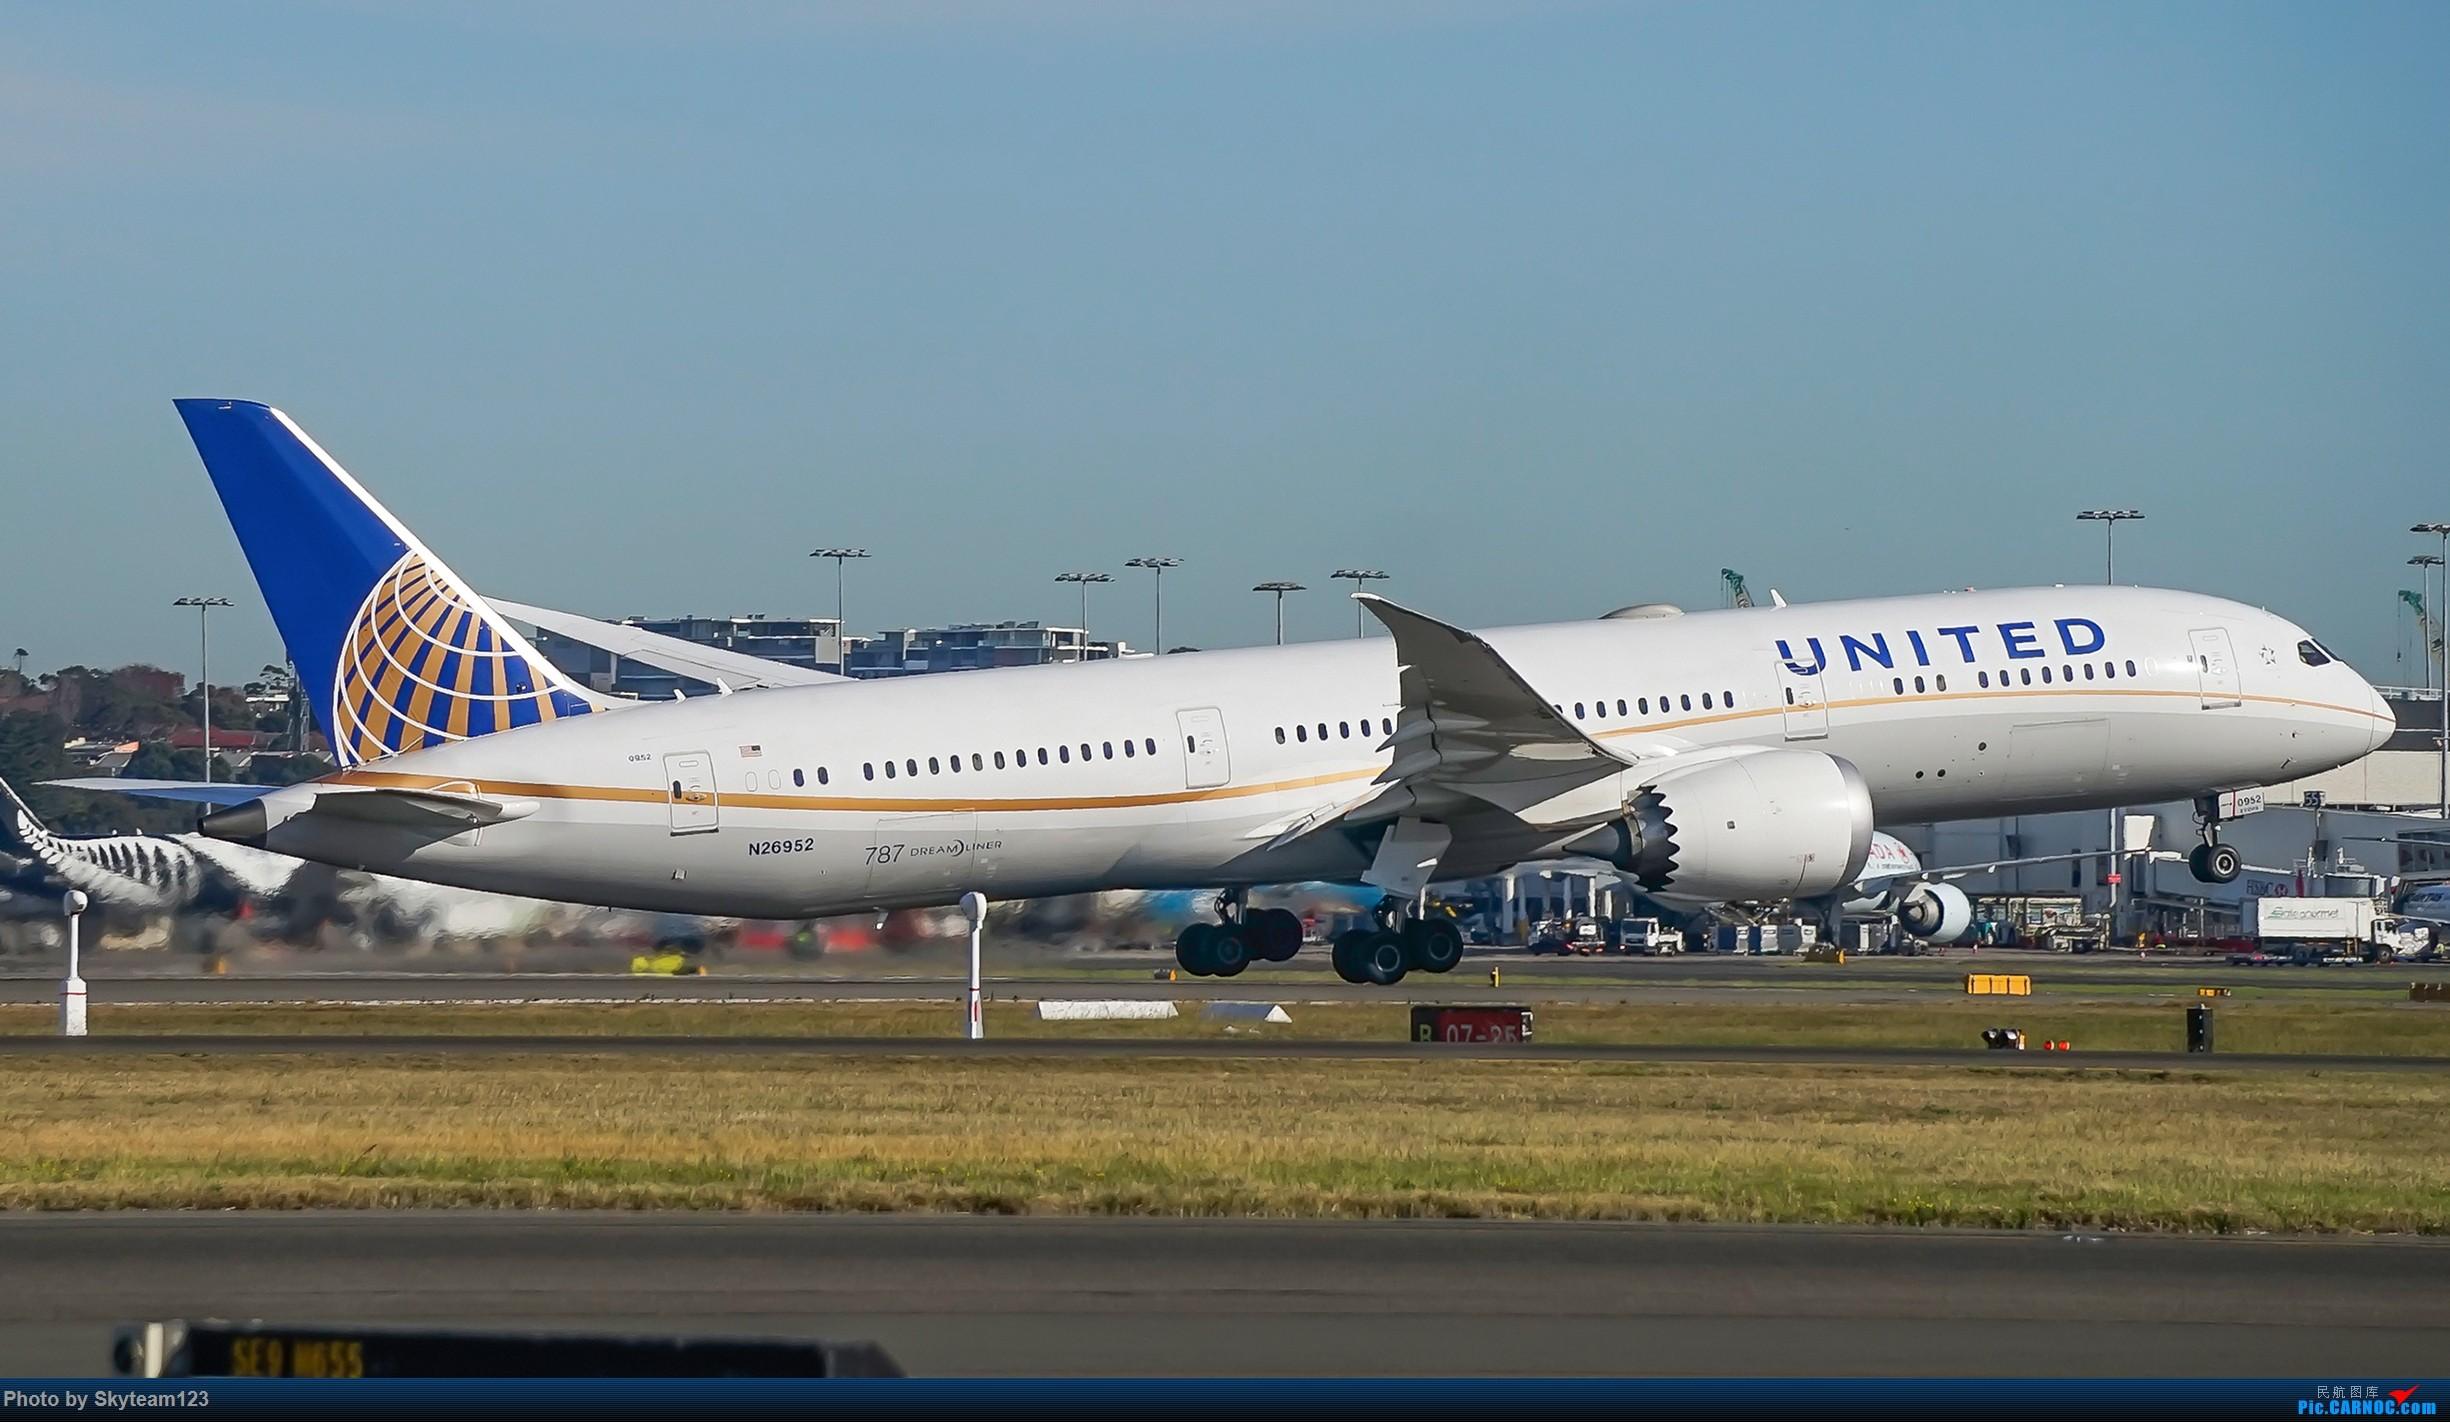 Re:[原创]【SYD】Blu EMU 停车场拍34L宽体起飞落地 BOEING 787-9 N26952 澳大利亚悉尼金斯福德·史密斯机场